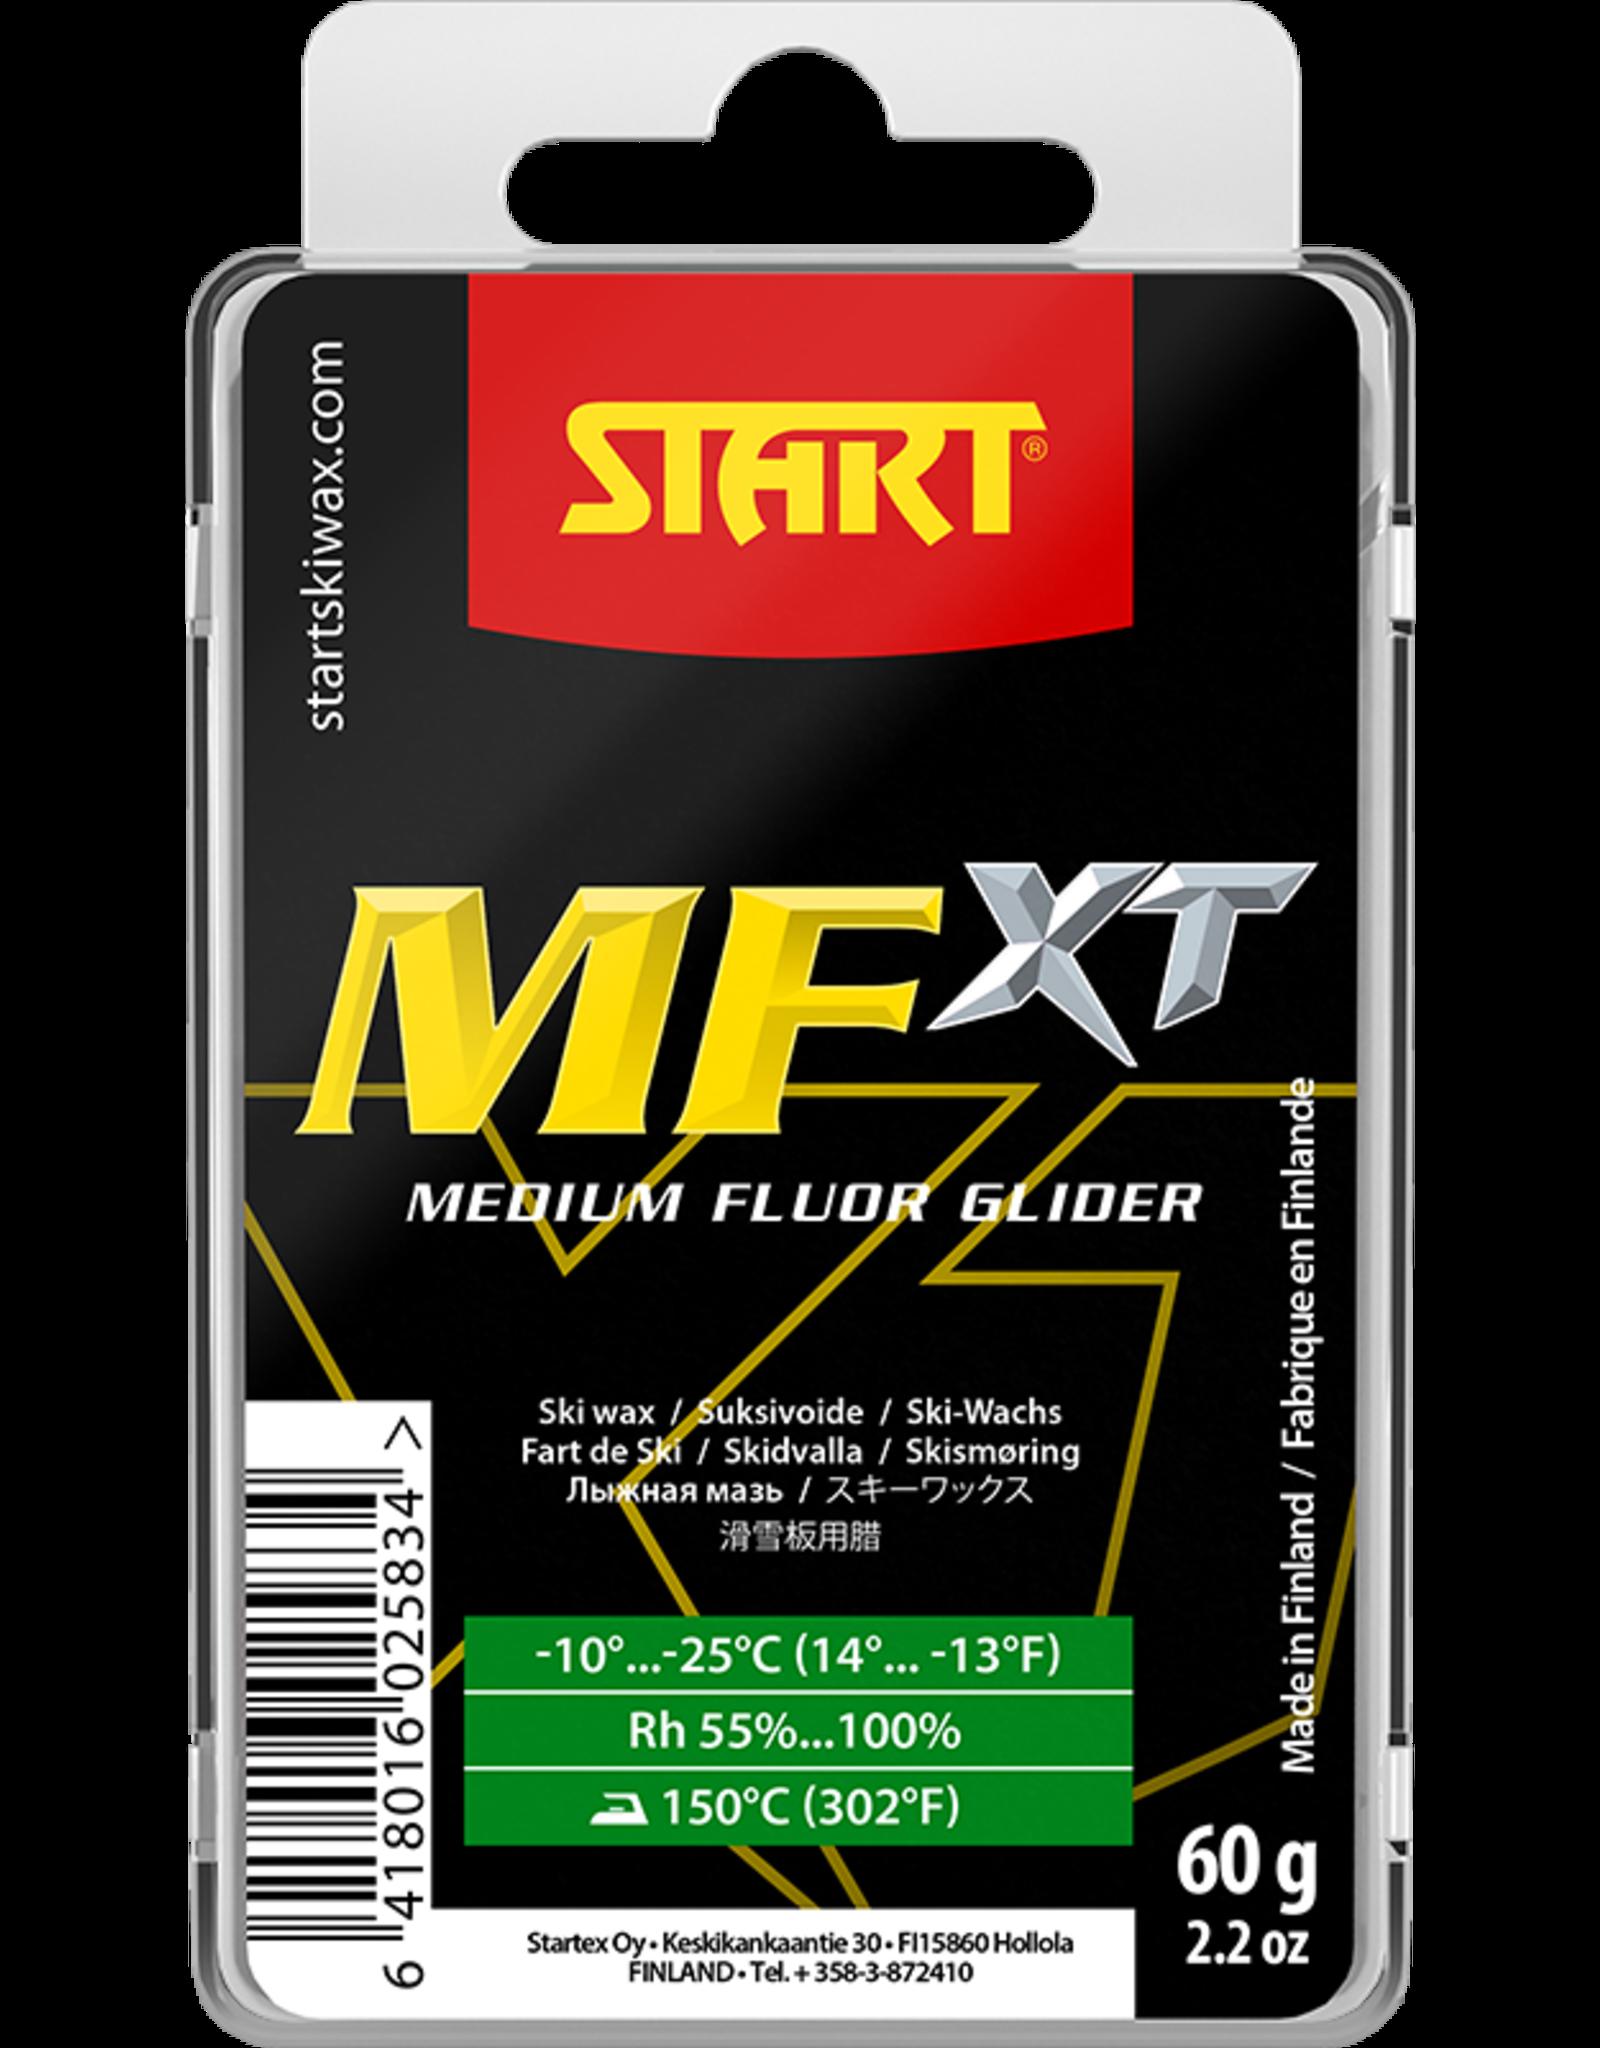 Start MFXT Green Fluor Glider 180g